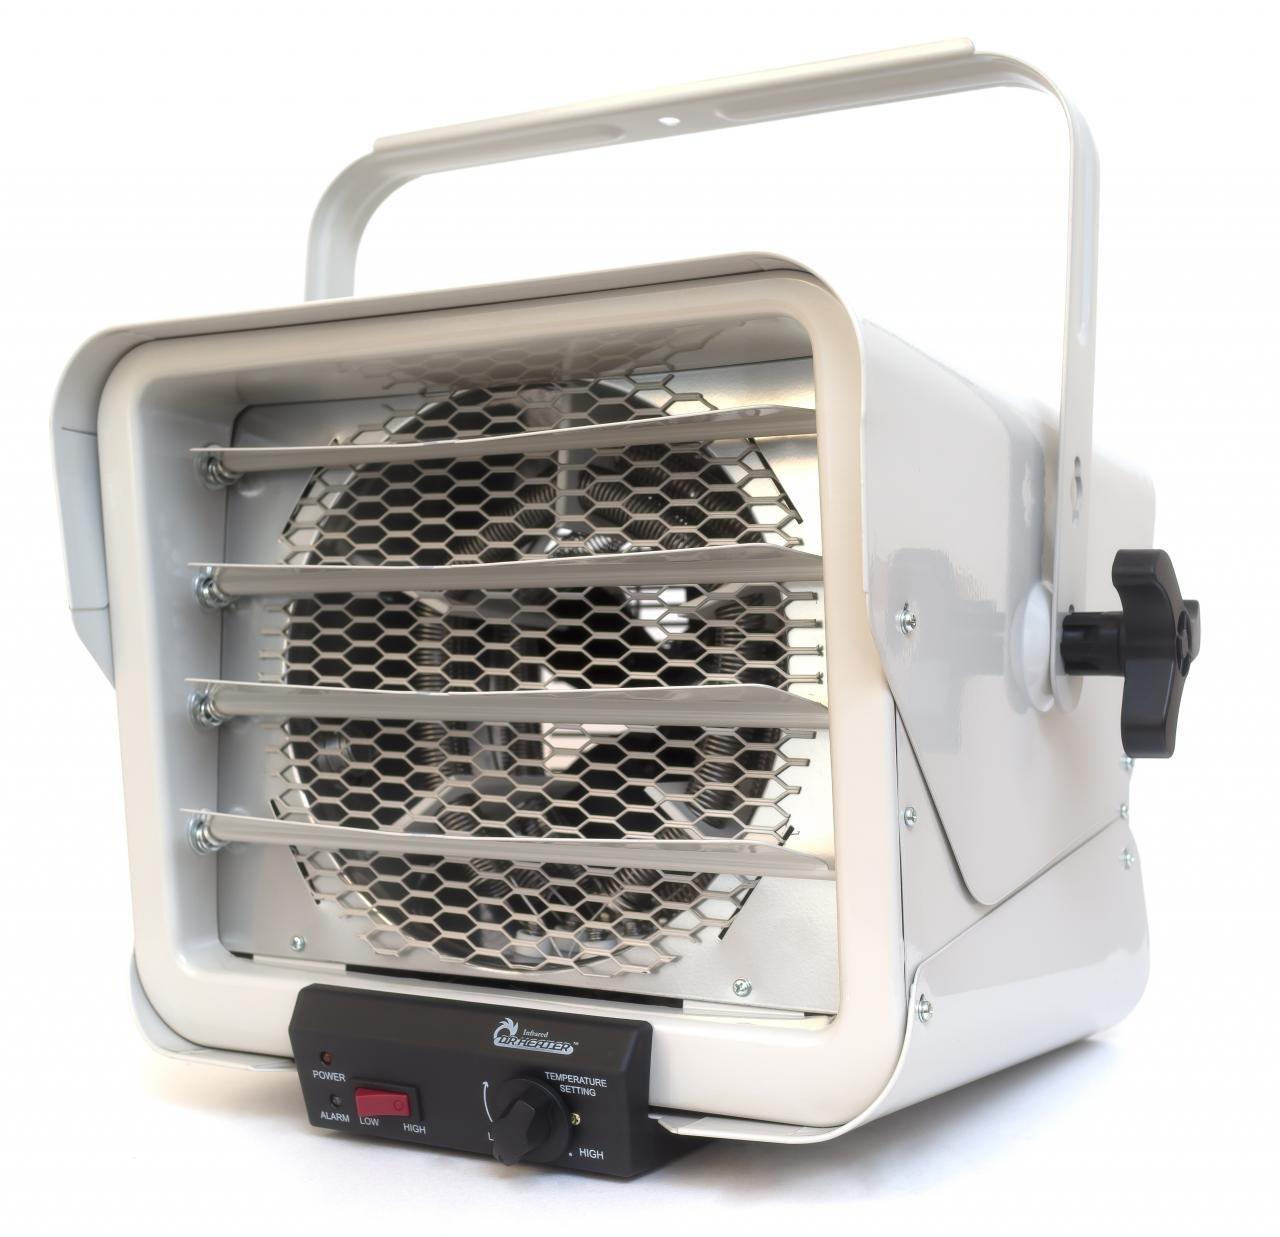 Dr. Heater DR966 240-volt Hardwired Shop Garage Commercial Heater, 3000-watt/6000-watt, DR966 240V by Dr Infrared Heater